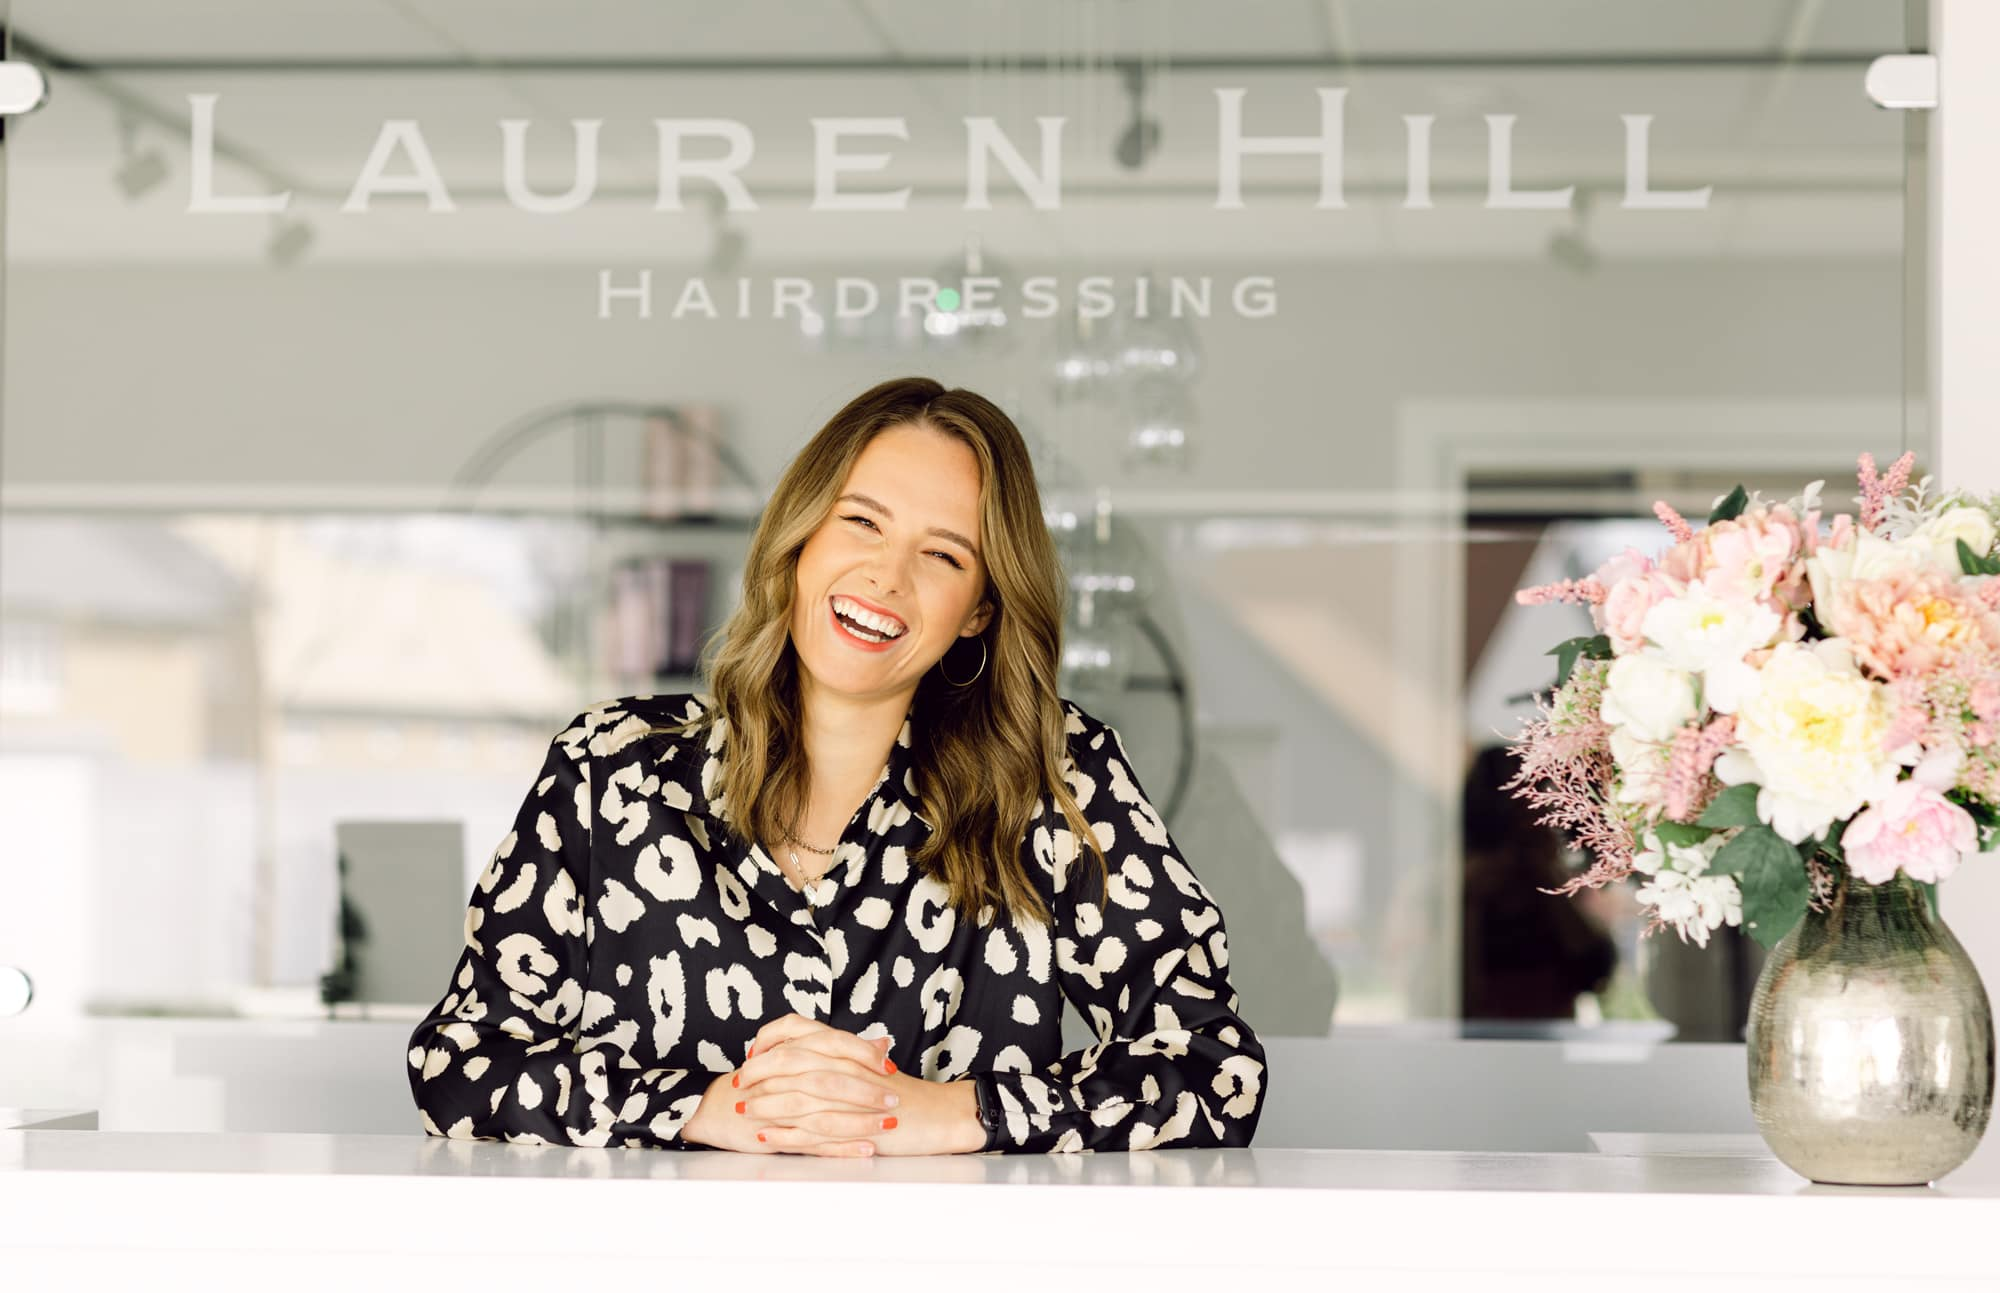 Hairdresser personal branding photoshoot